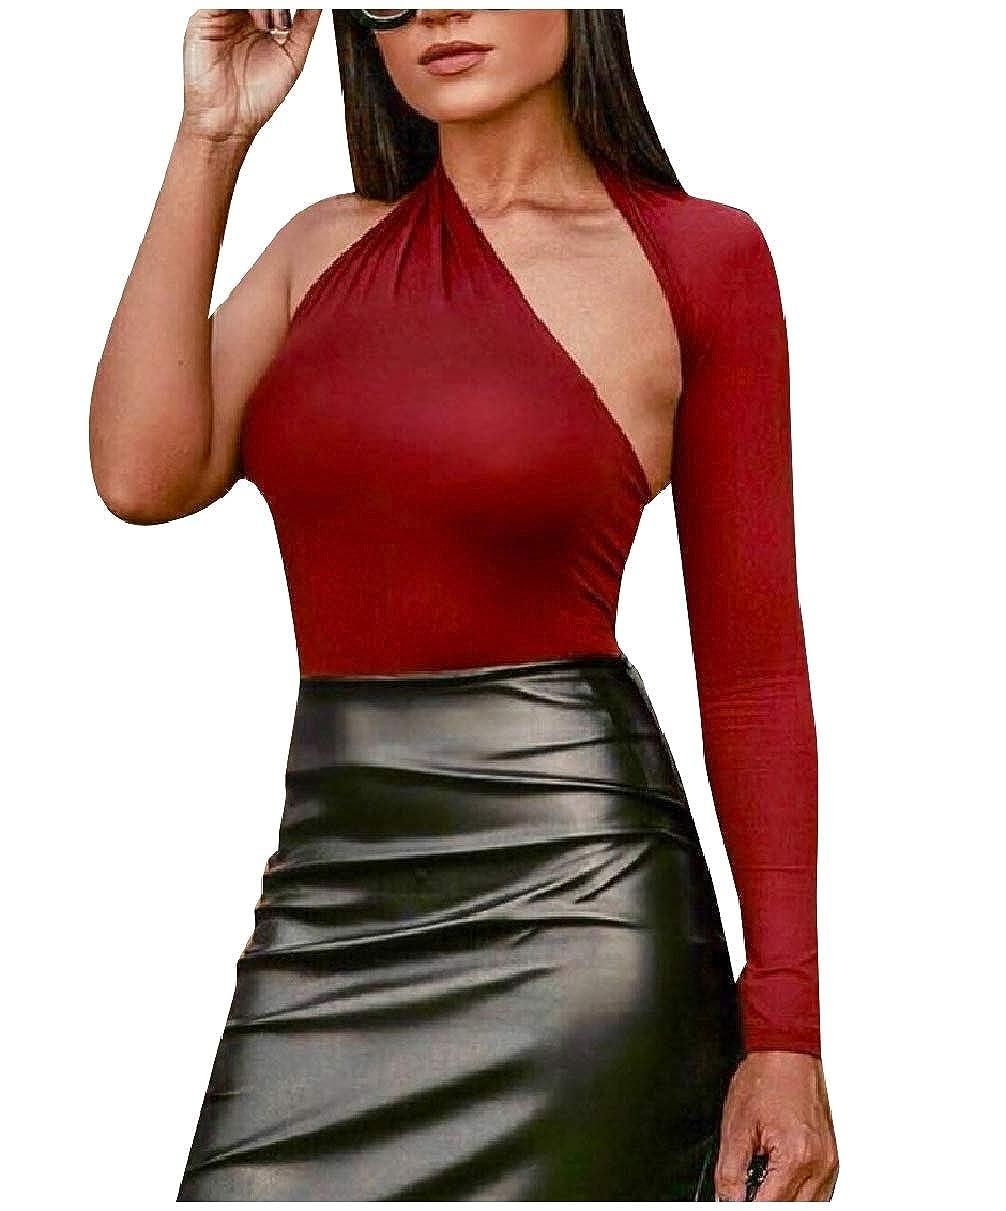 FieerWomen Bodysuit Bodycon Top One Shoulder Stretch Jumpsuits Rompers